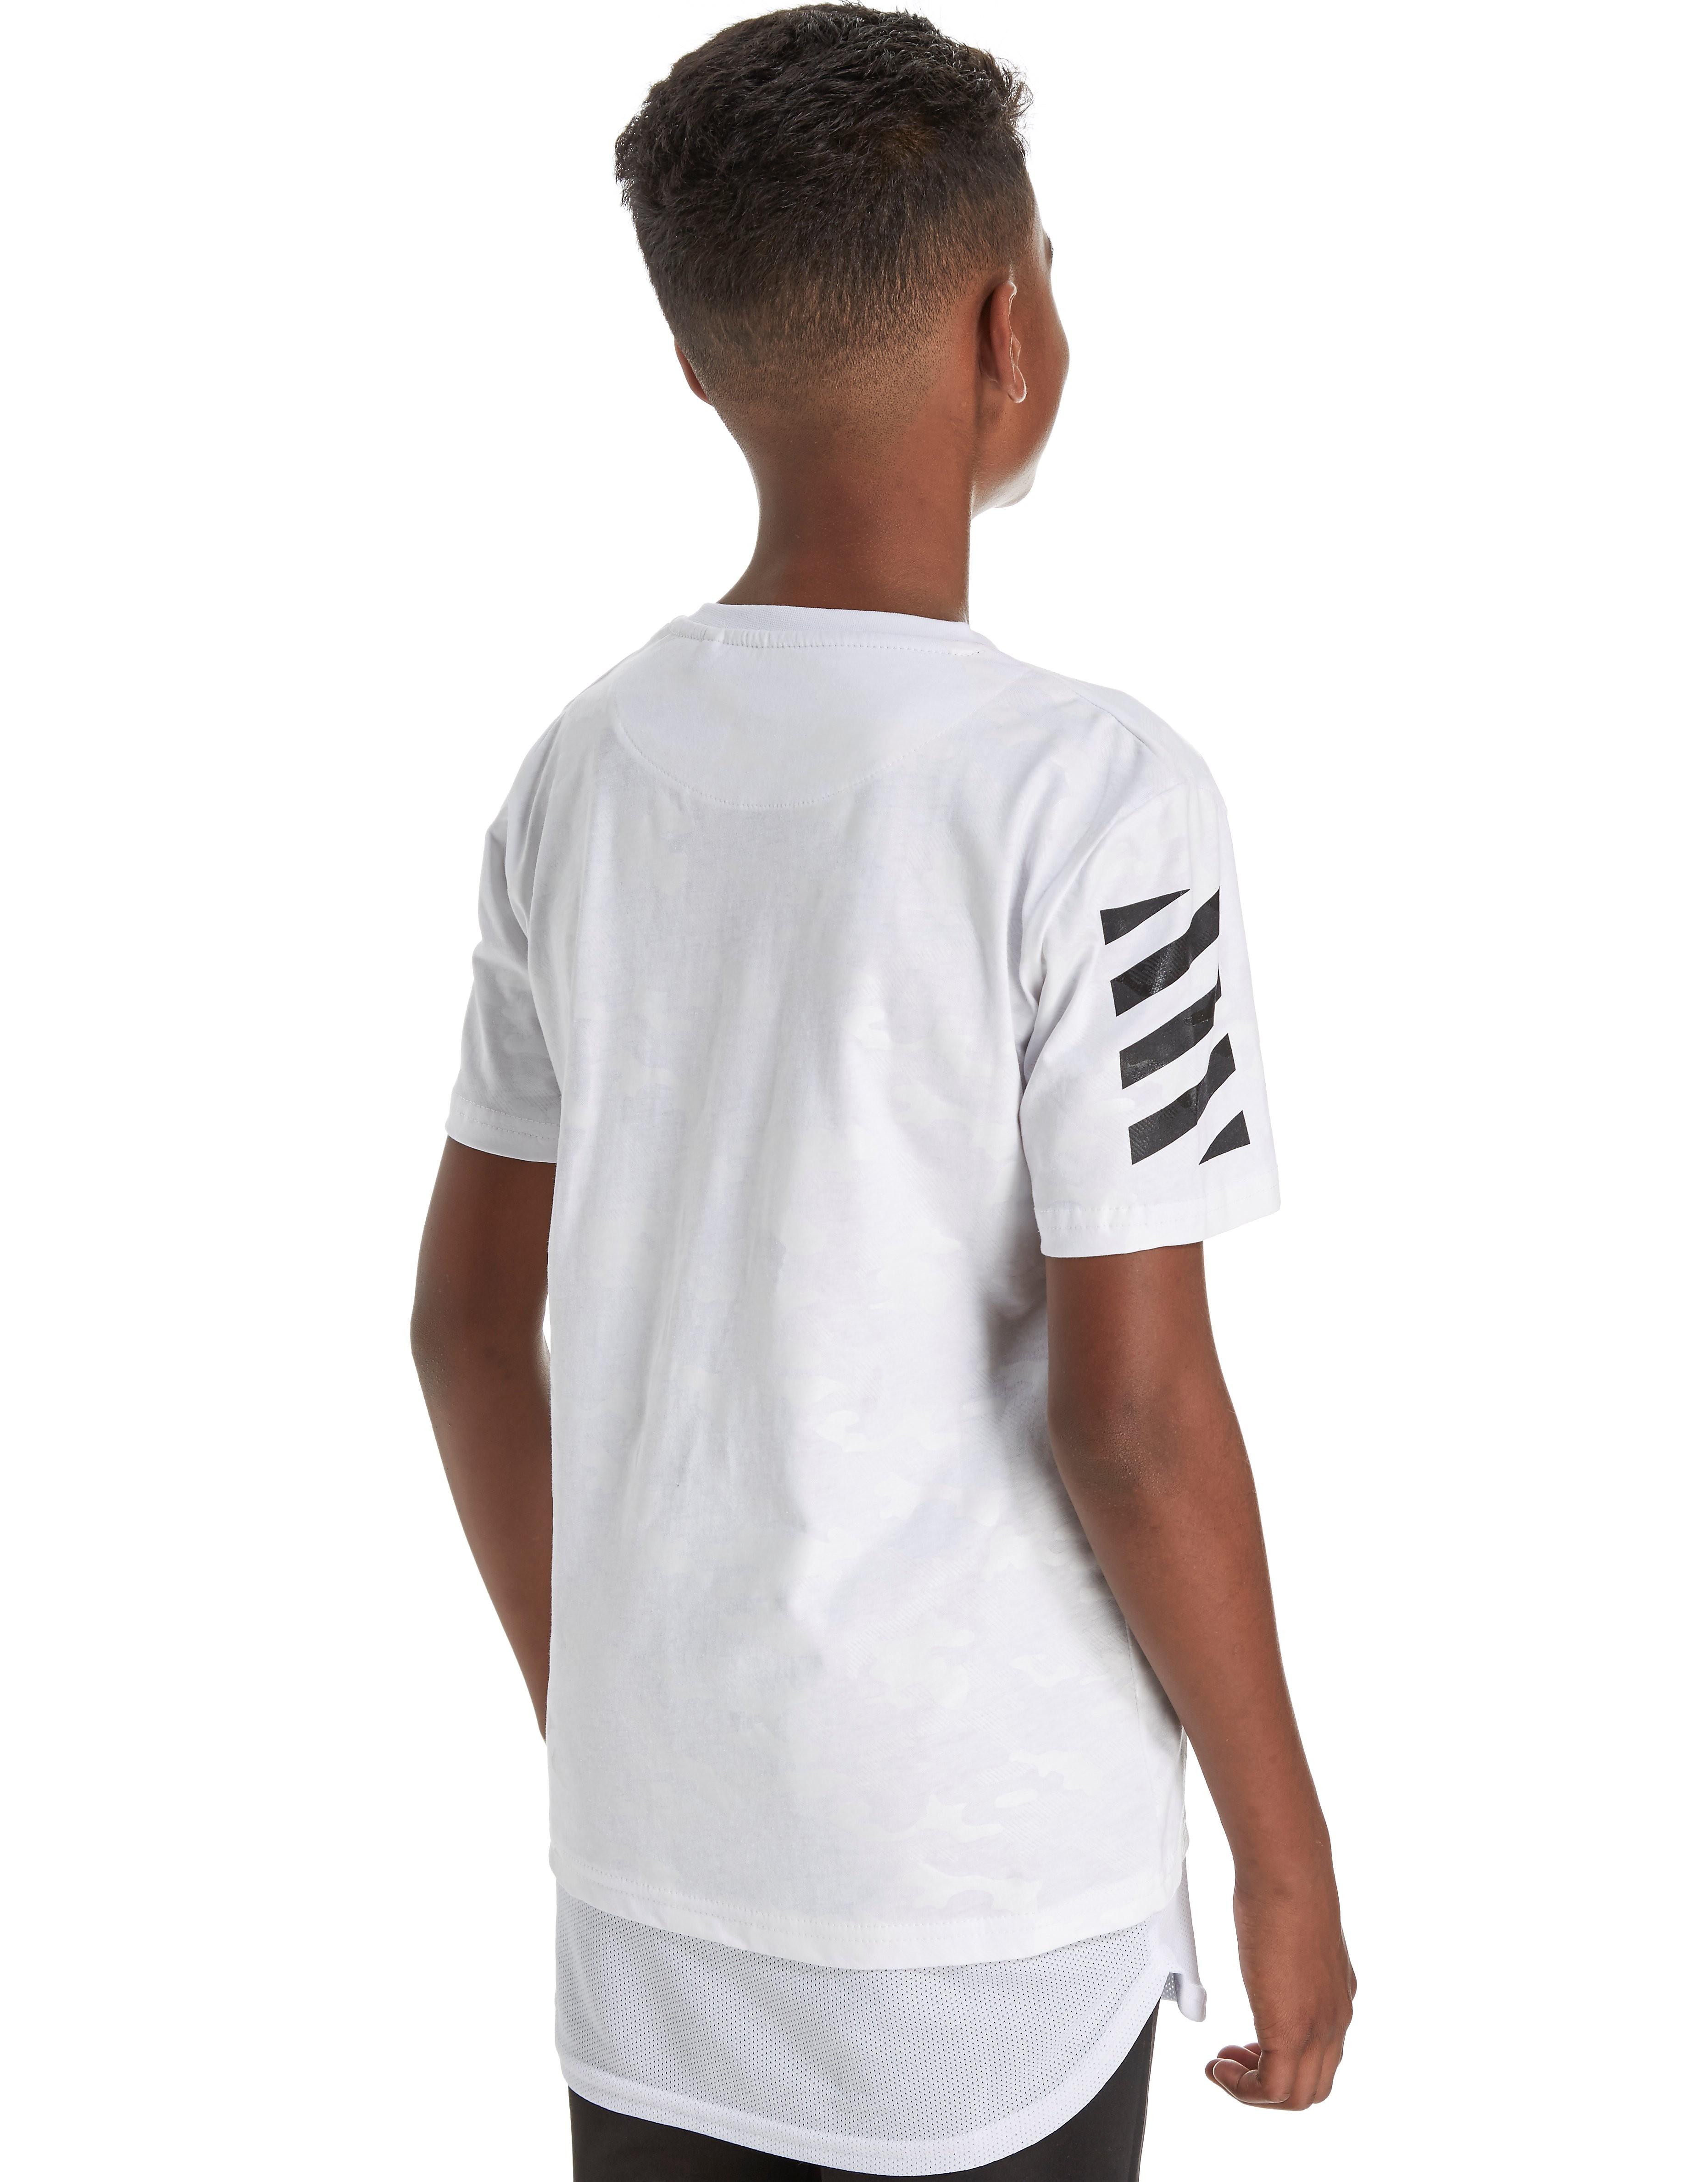 Sonneti Blade-Run T-Shirt